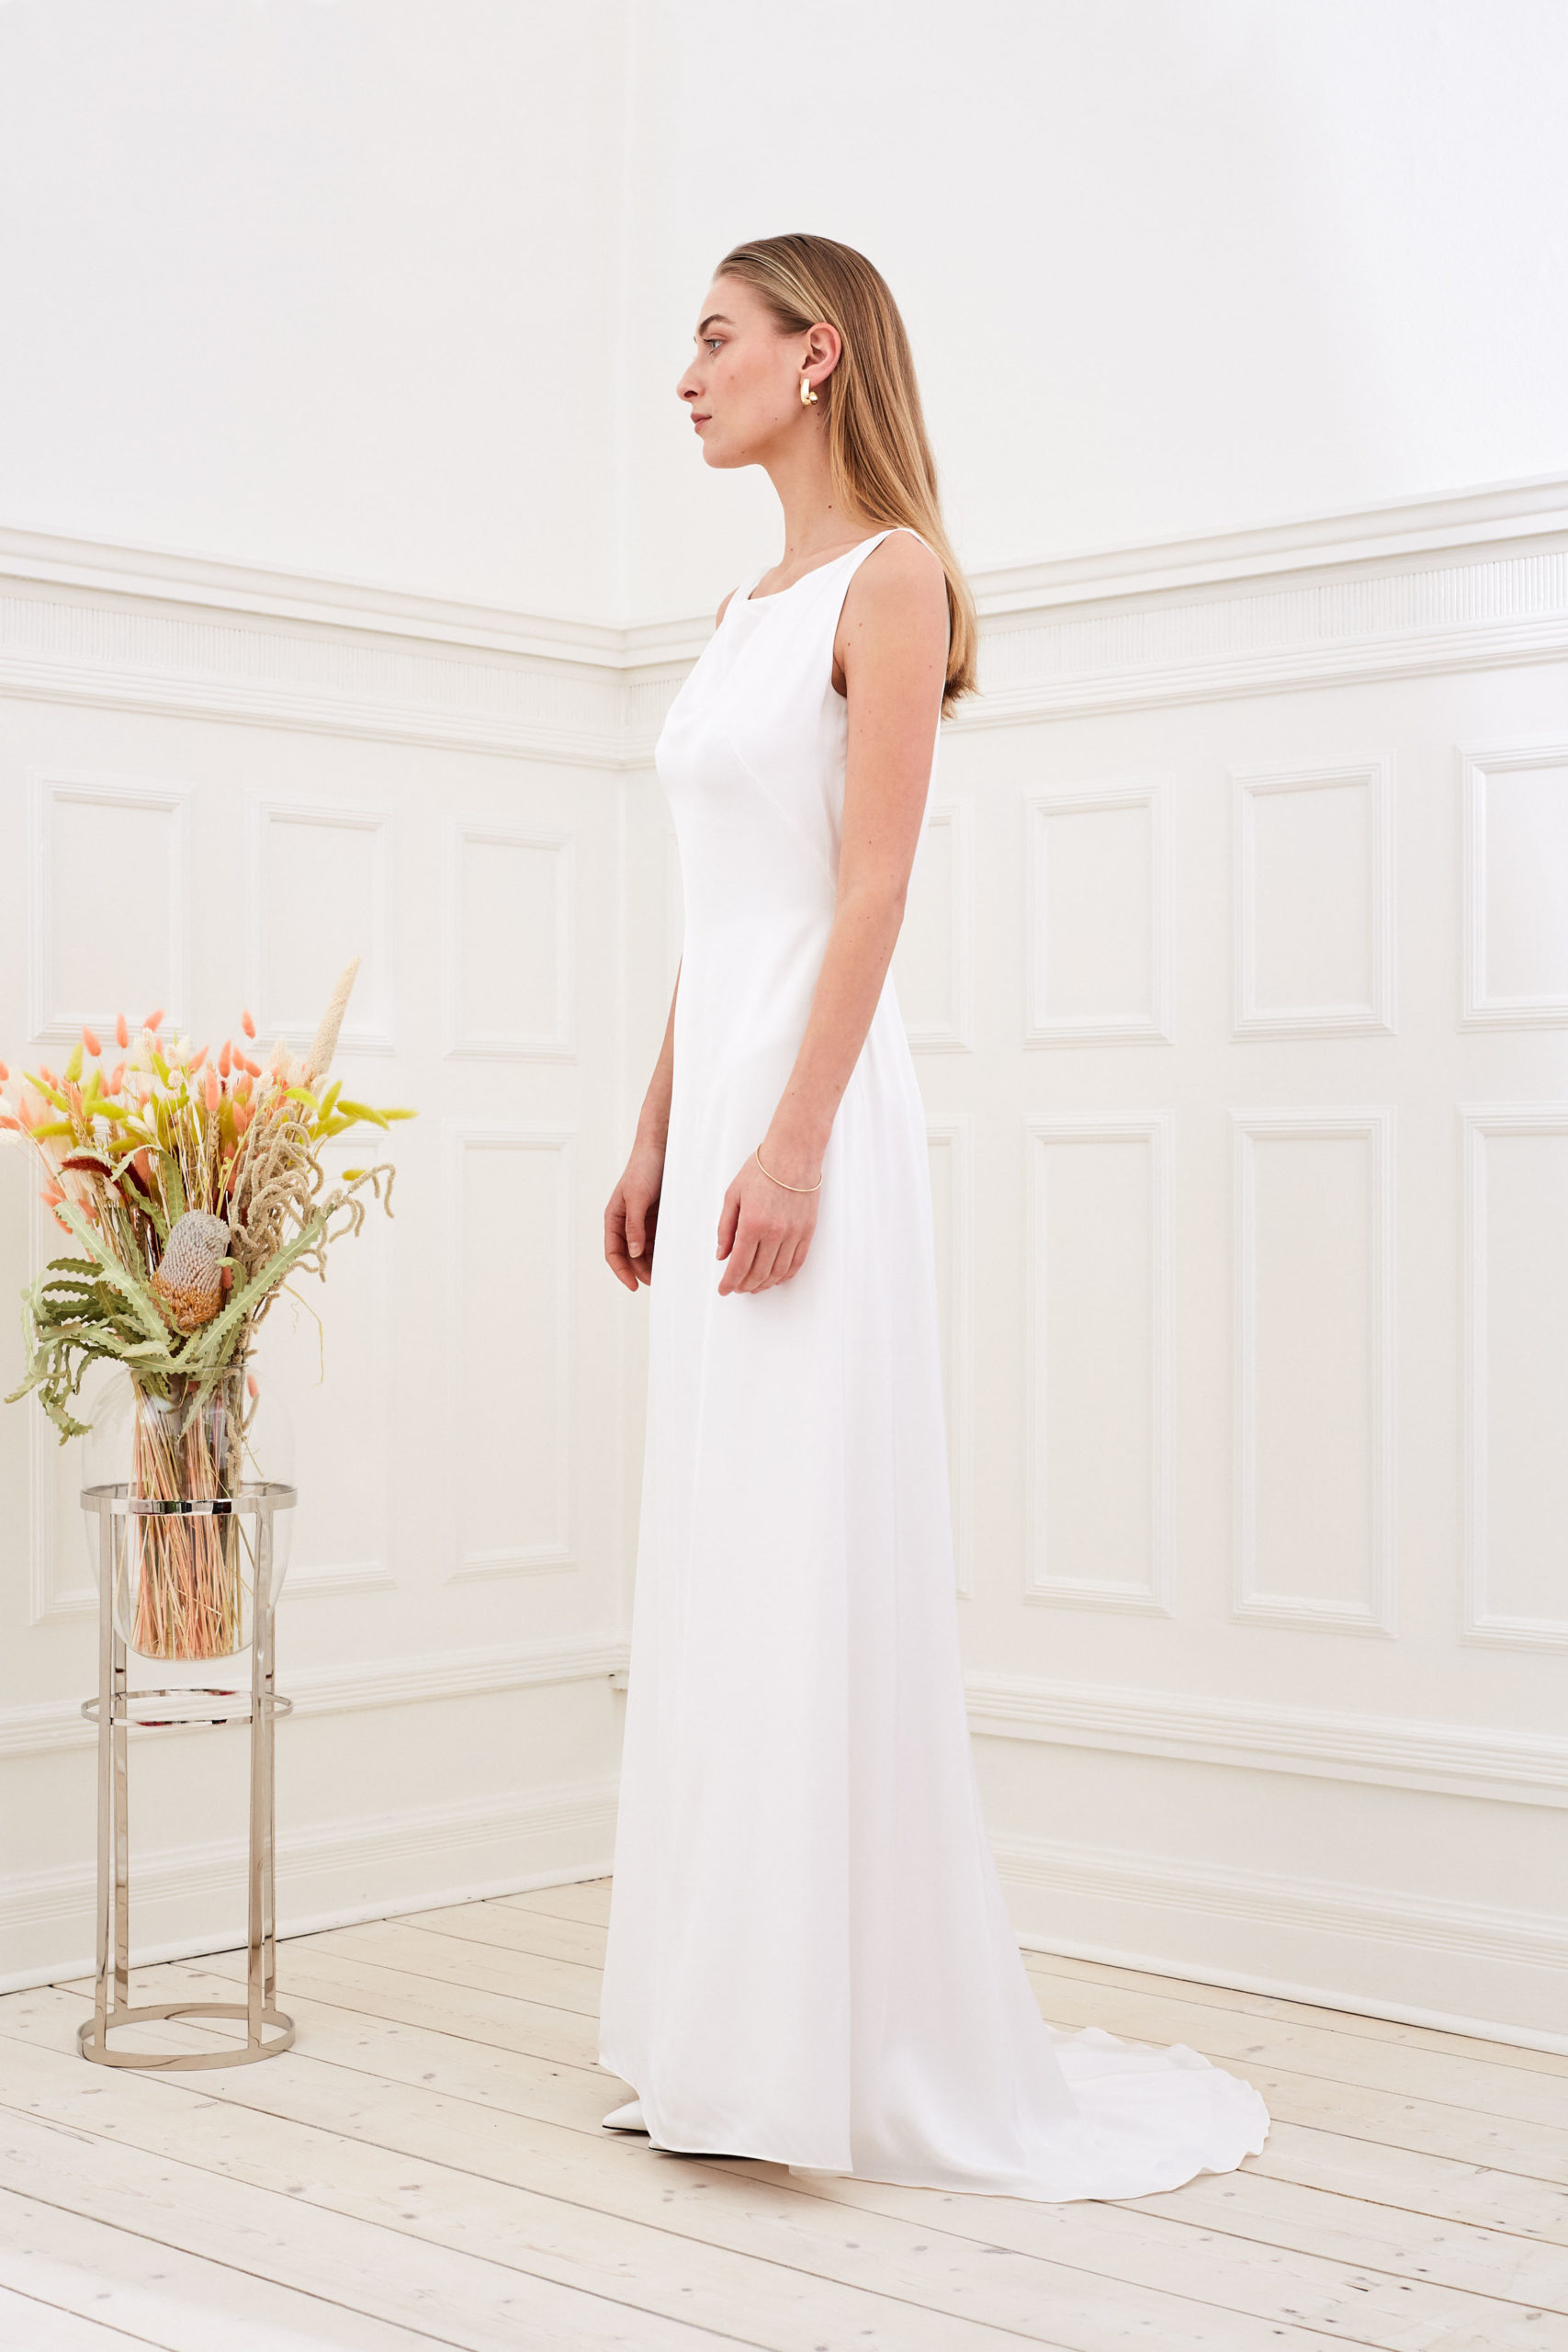 Amber - Minimalist wedding dress side